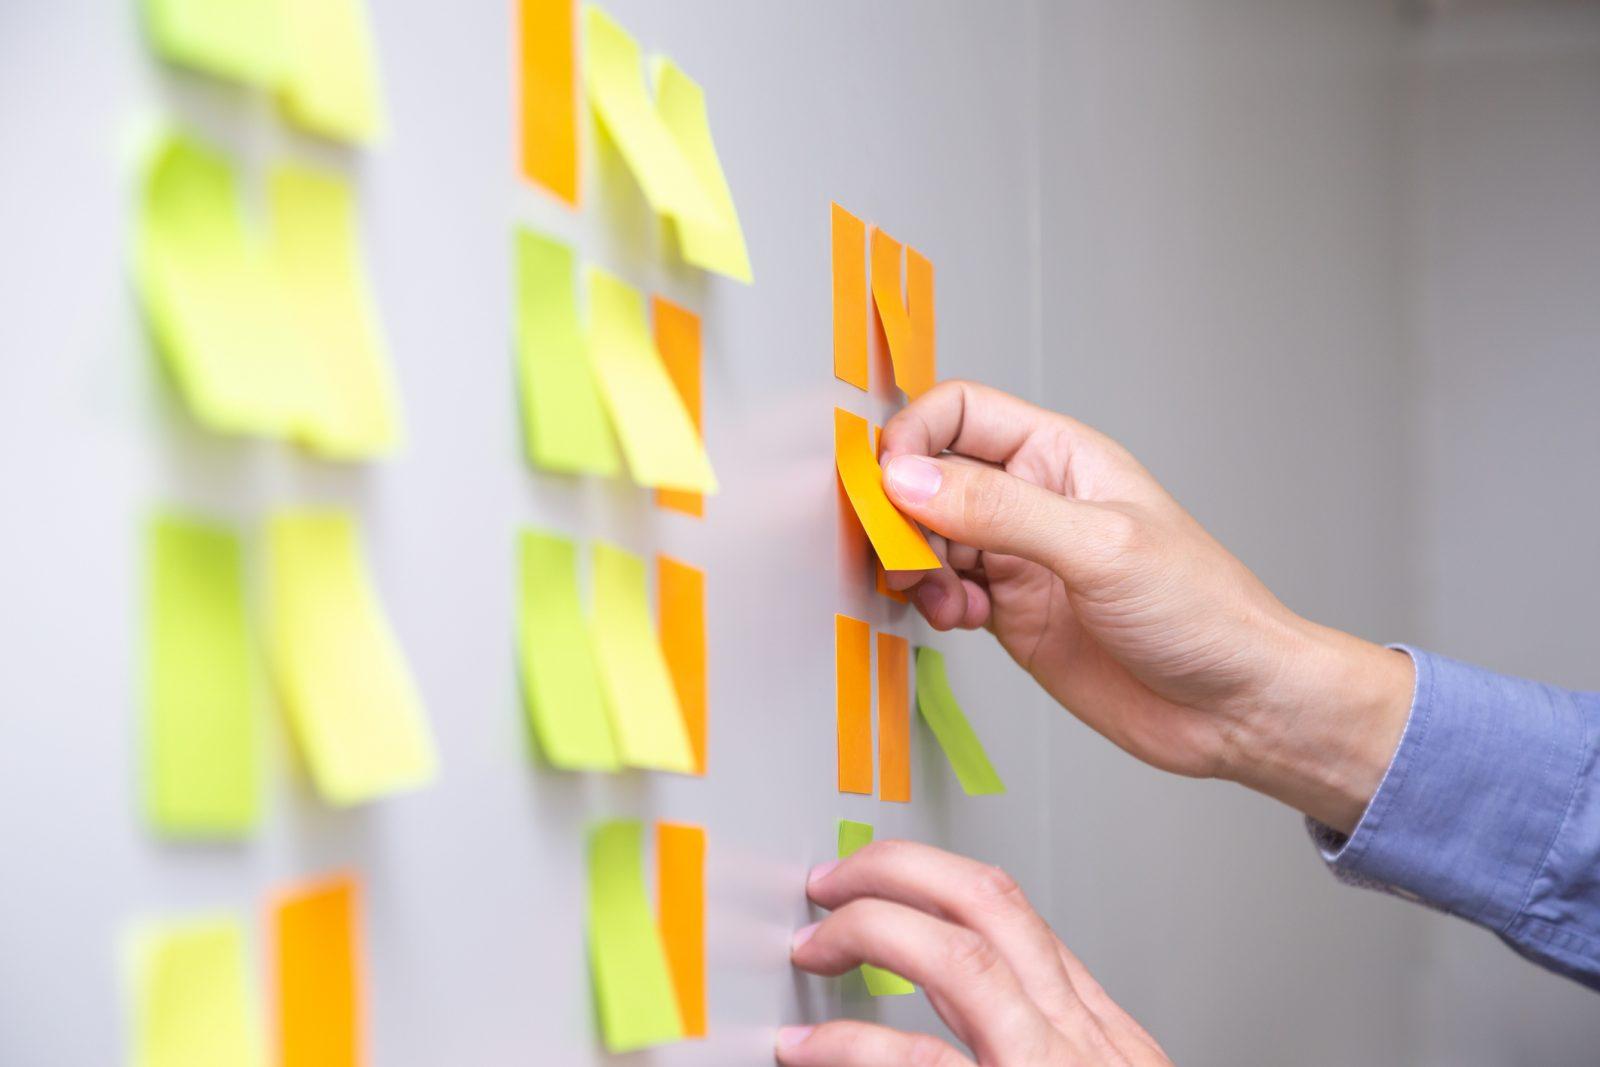 Agiles Projektmanagement für Architekten: Projektplanung am Kanban Board (Foto: comzeal / iStock)